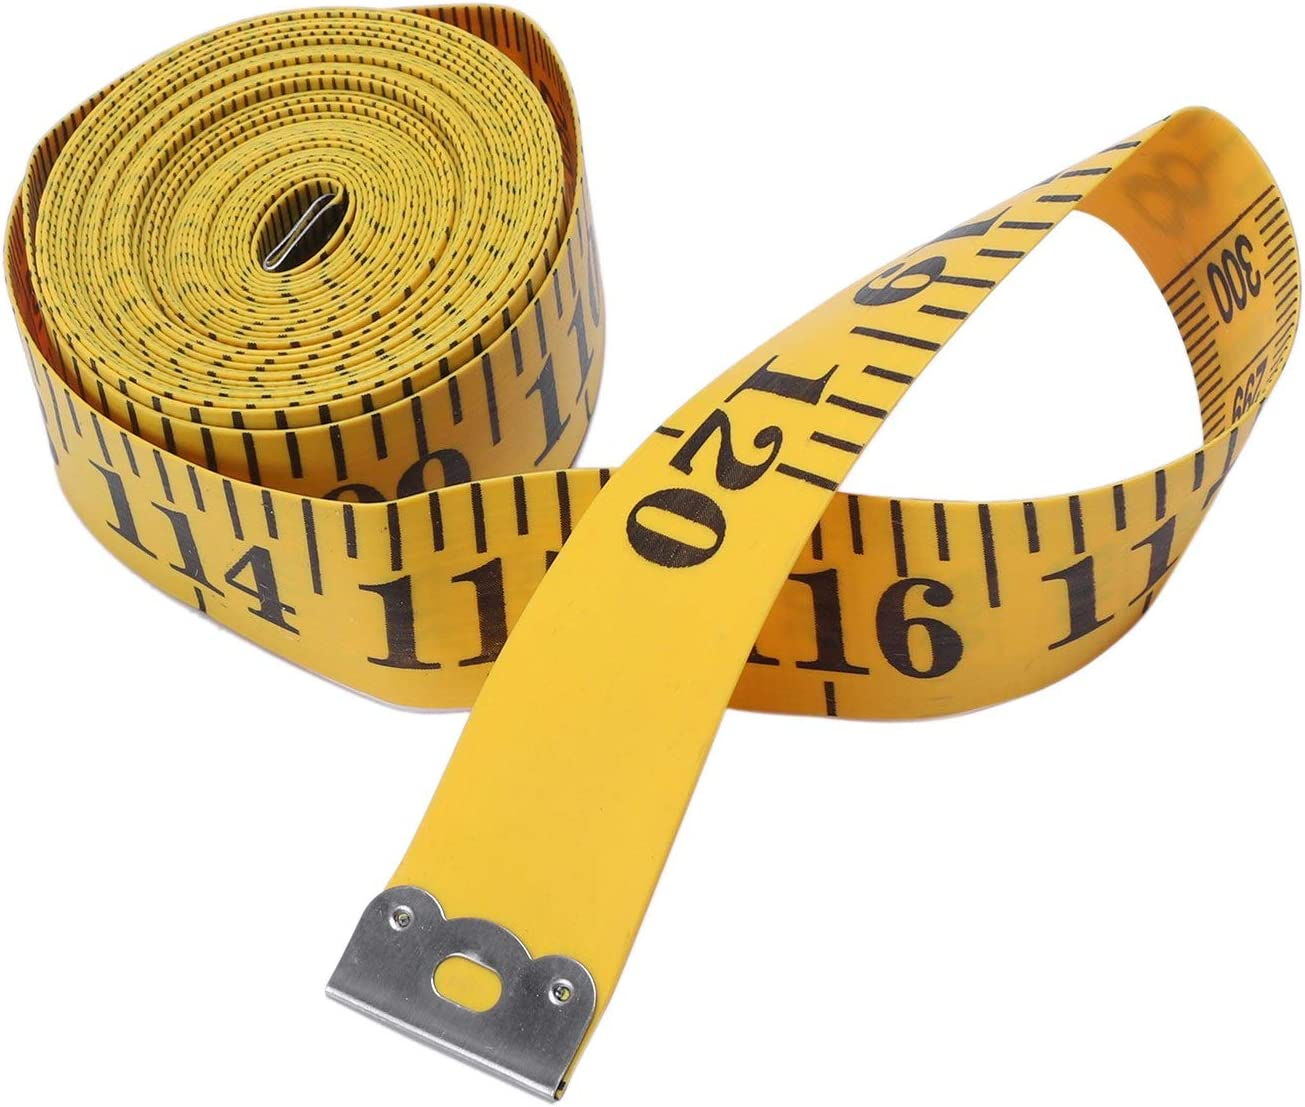 Etase Soft 3Meter 300CM Sewing Tailor Ranking TOP14 Measur Tape Body Super sale Measuring